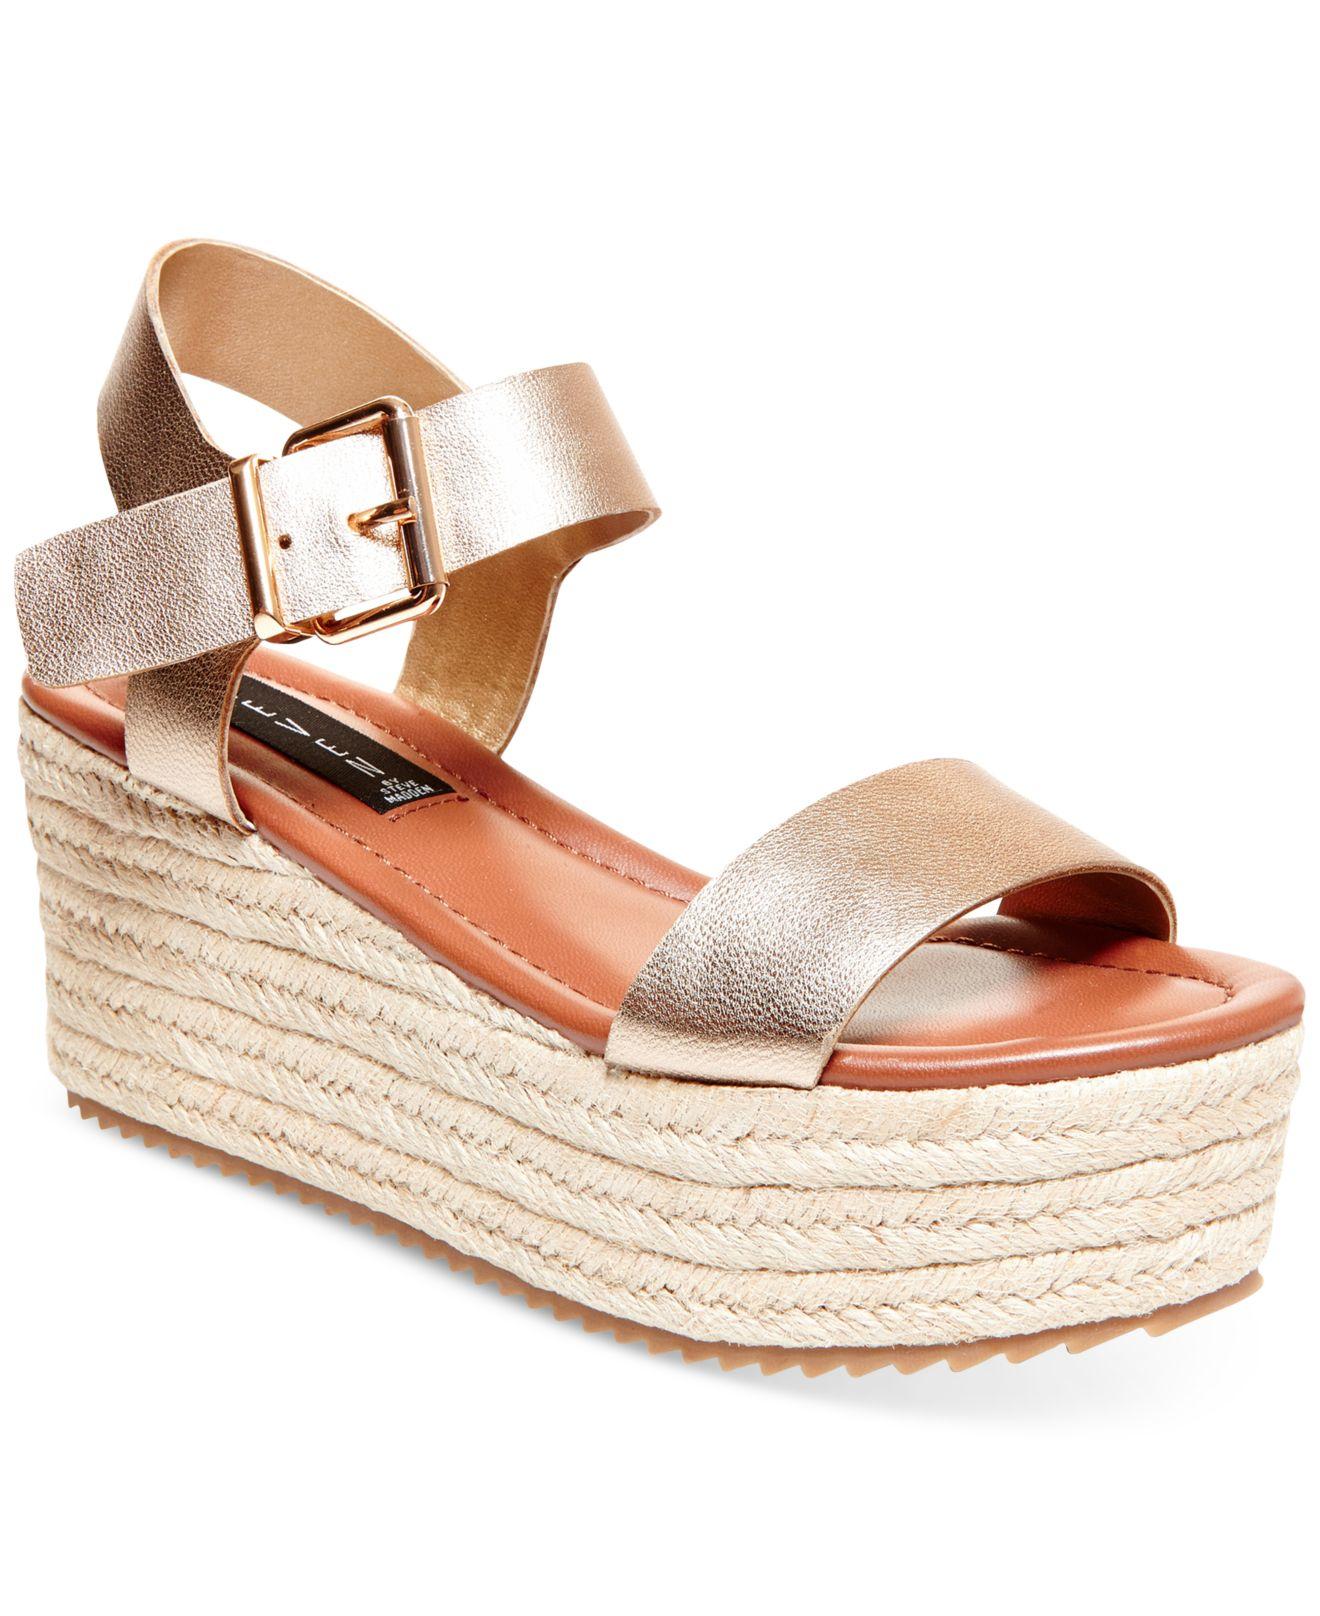 04fbdc2a07b Lyst - Steven by Steve Madden Women s Sabbie Platform Sandals in ...